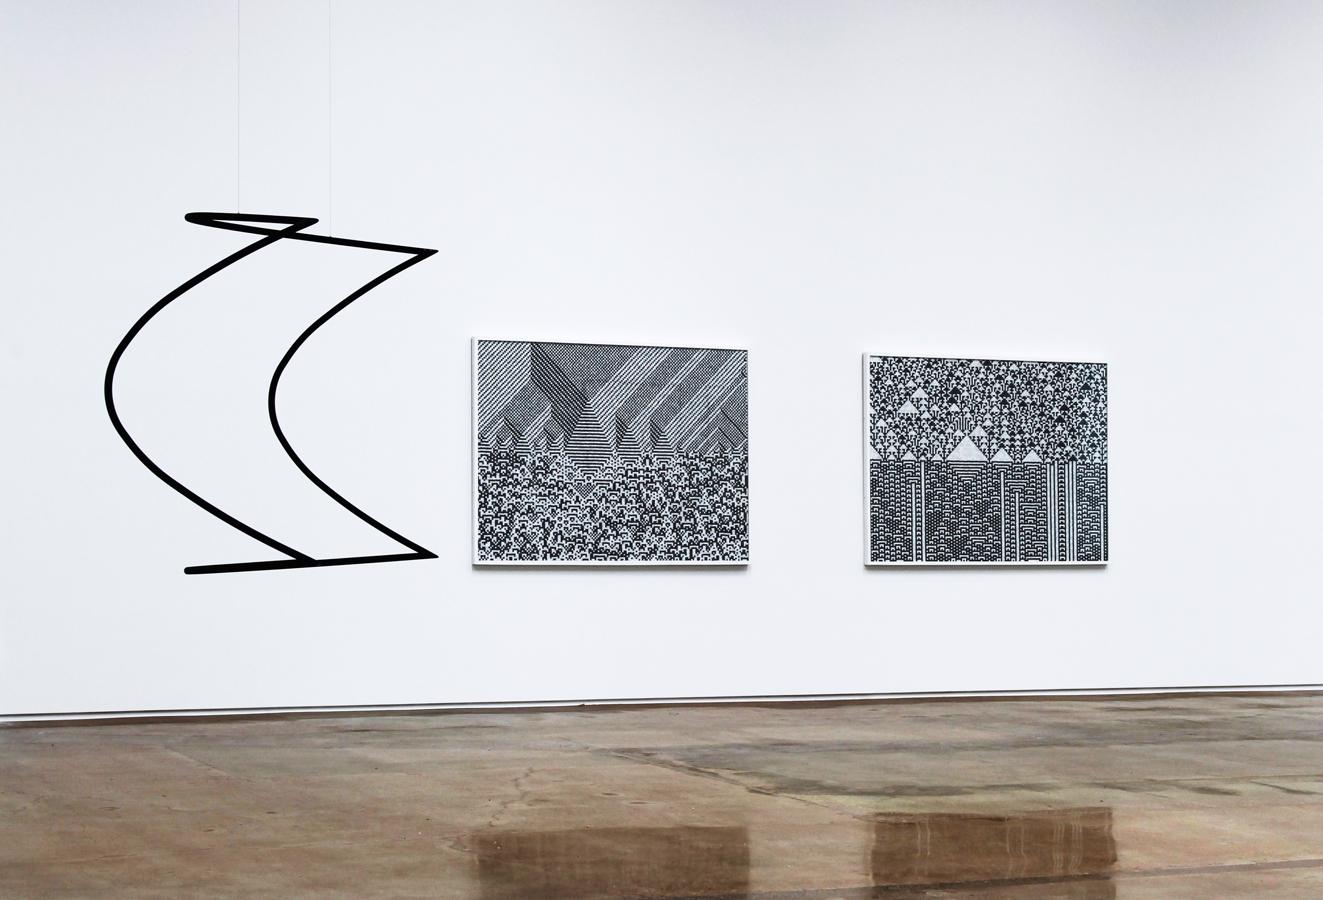 'Cartography of Control', Installation View, Kohn Gallery, 2015 | Troika (Conny Freyer, Eva Rucki, Sebastien Noel)